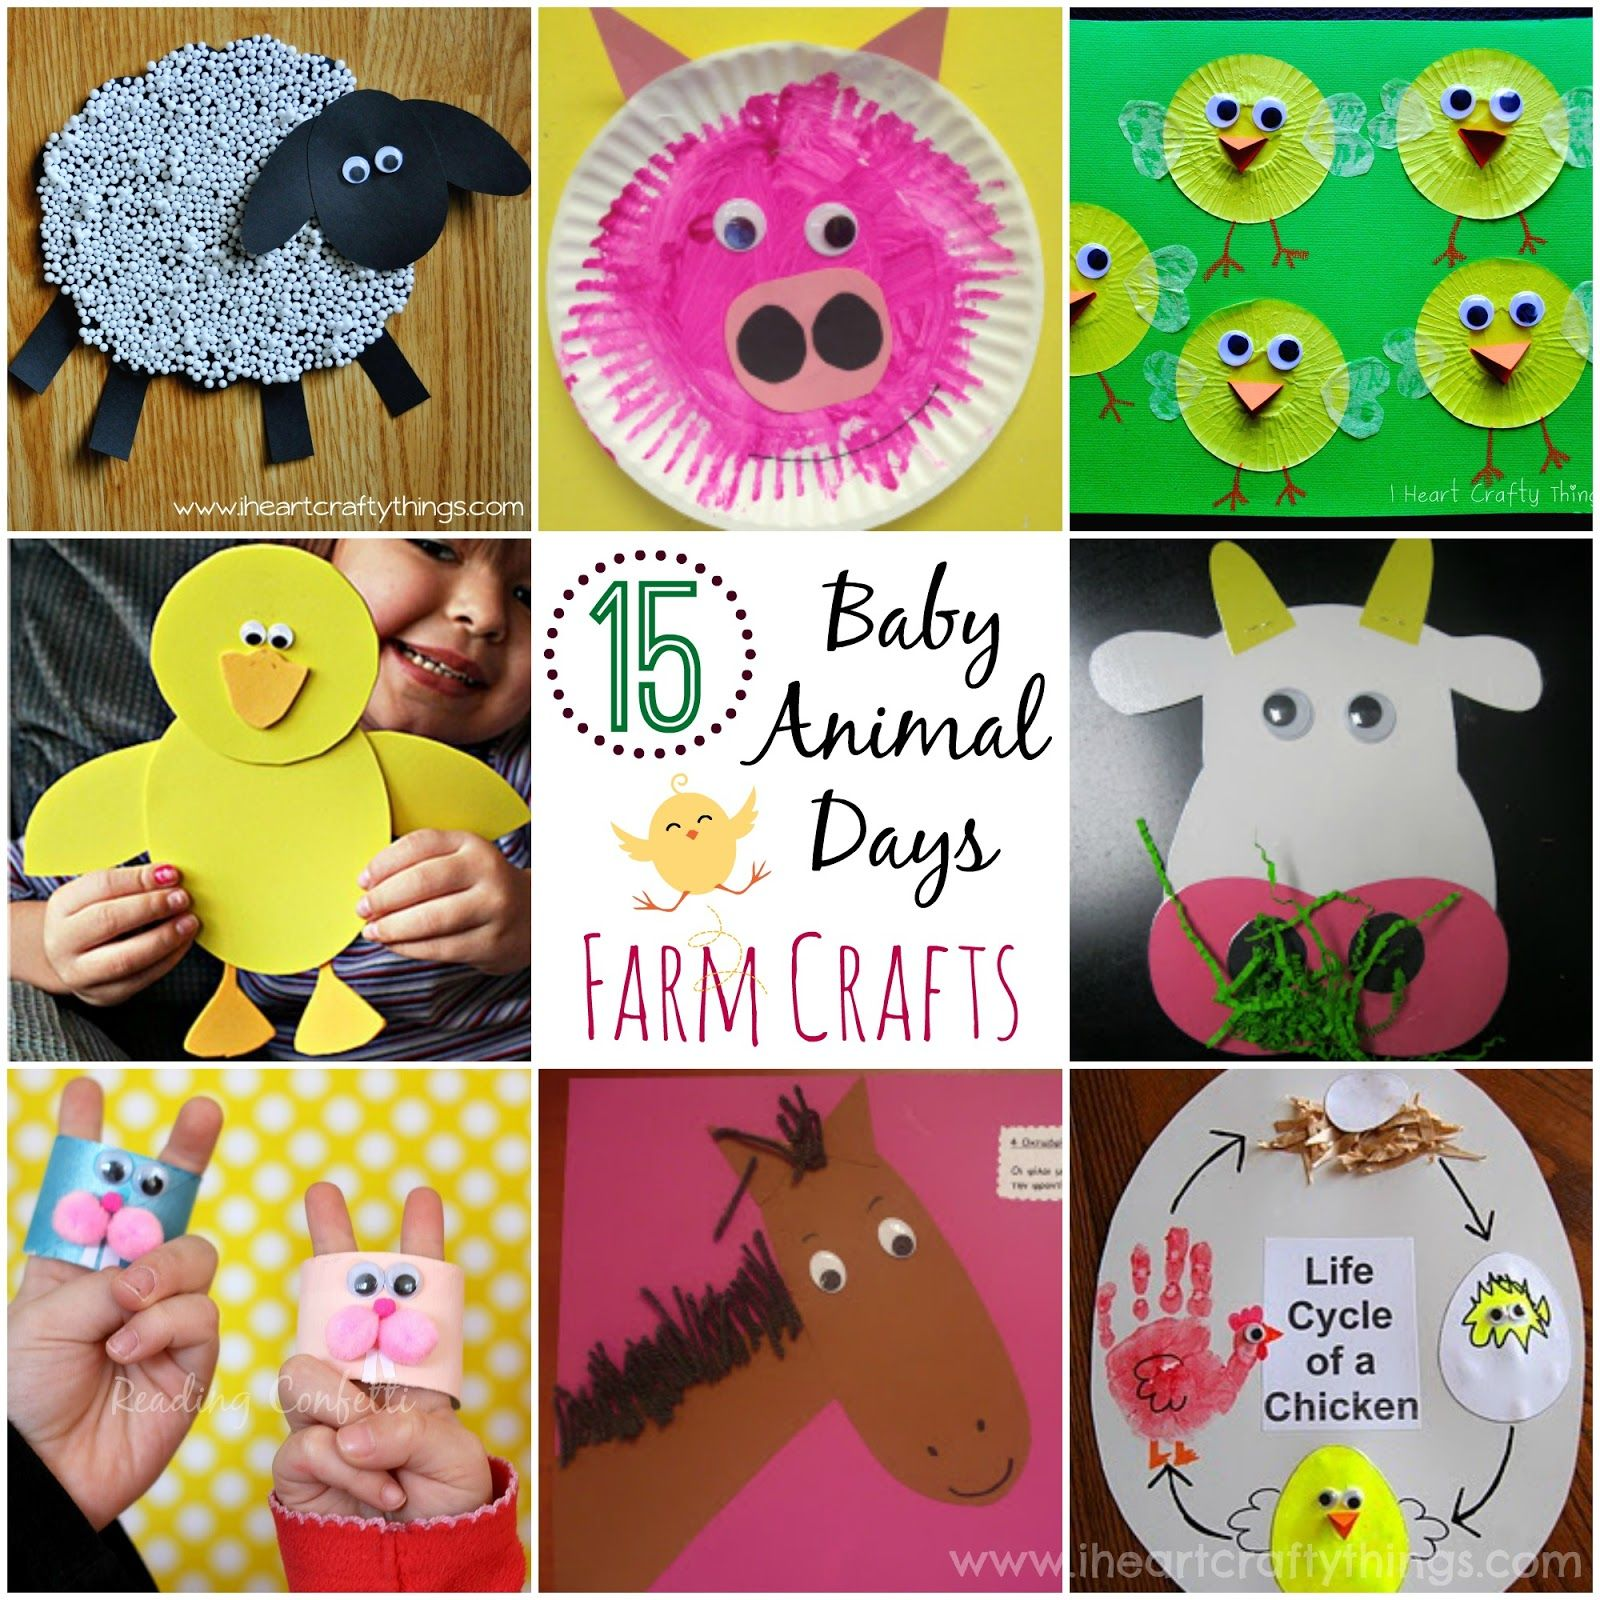 15 Baby Animal Days Farm Crafts For Kids